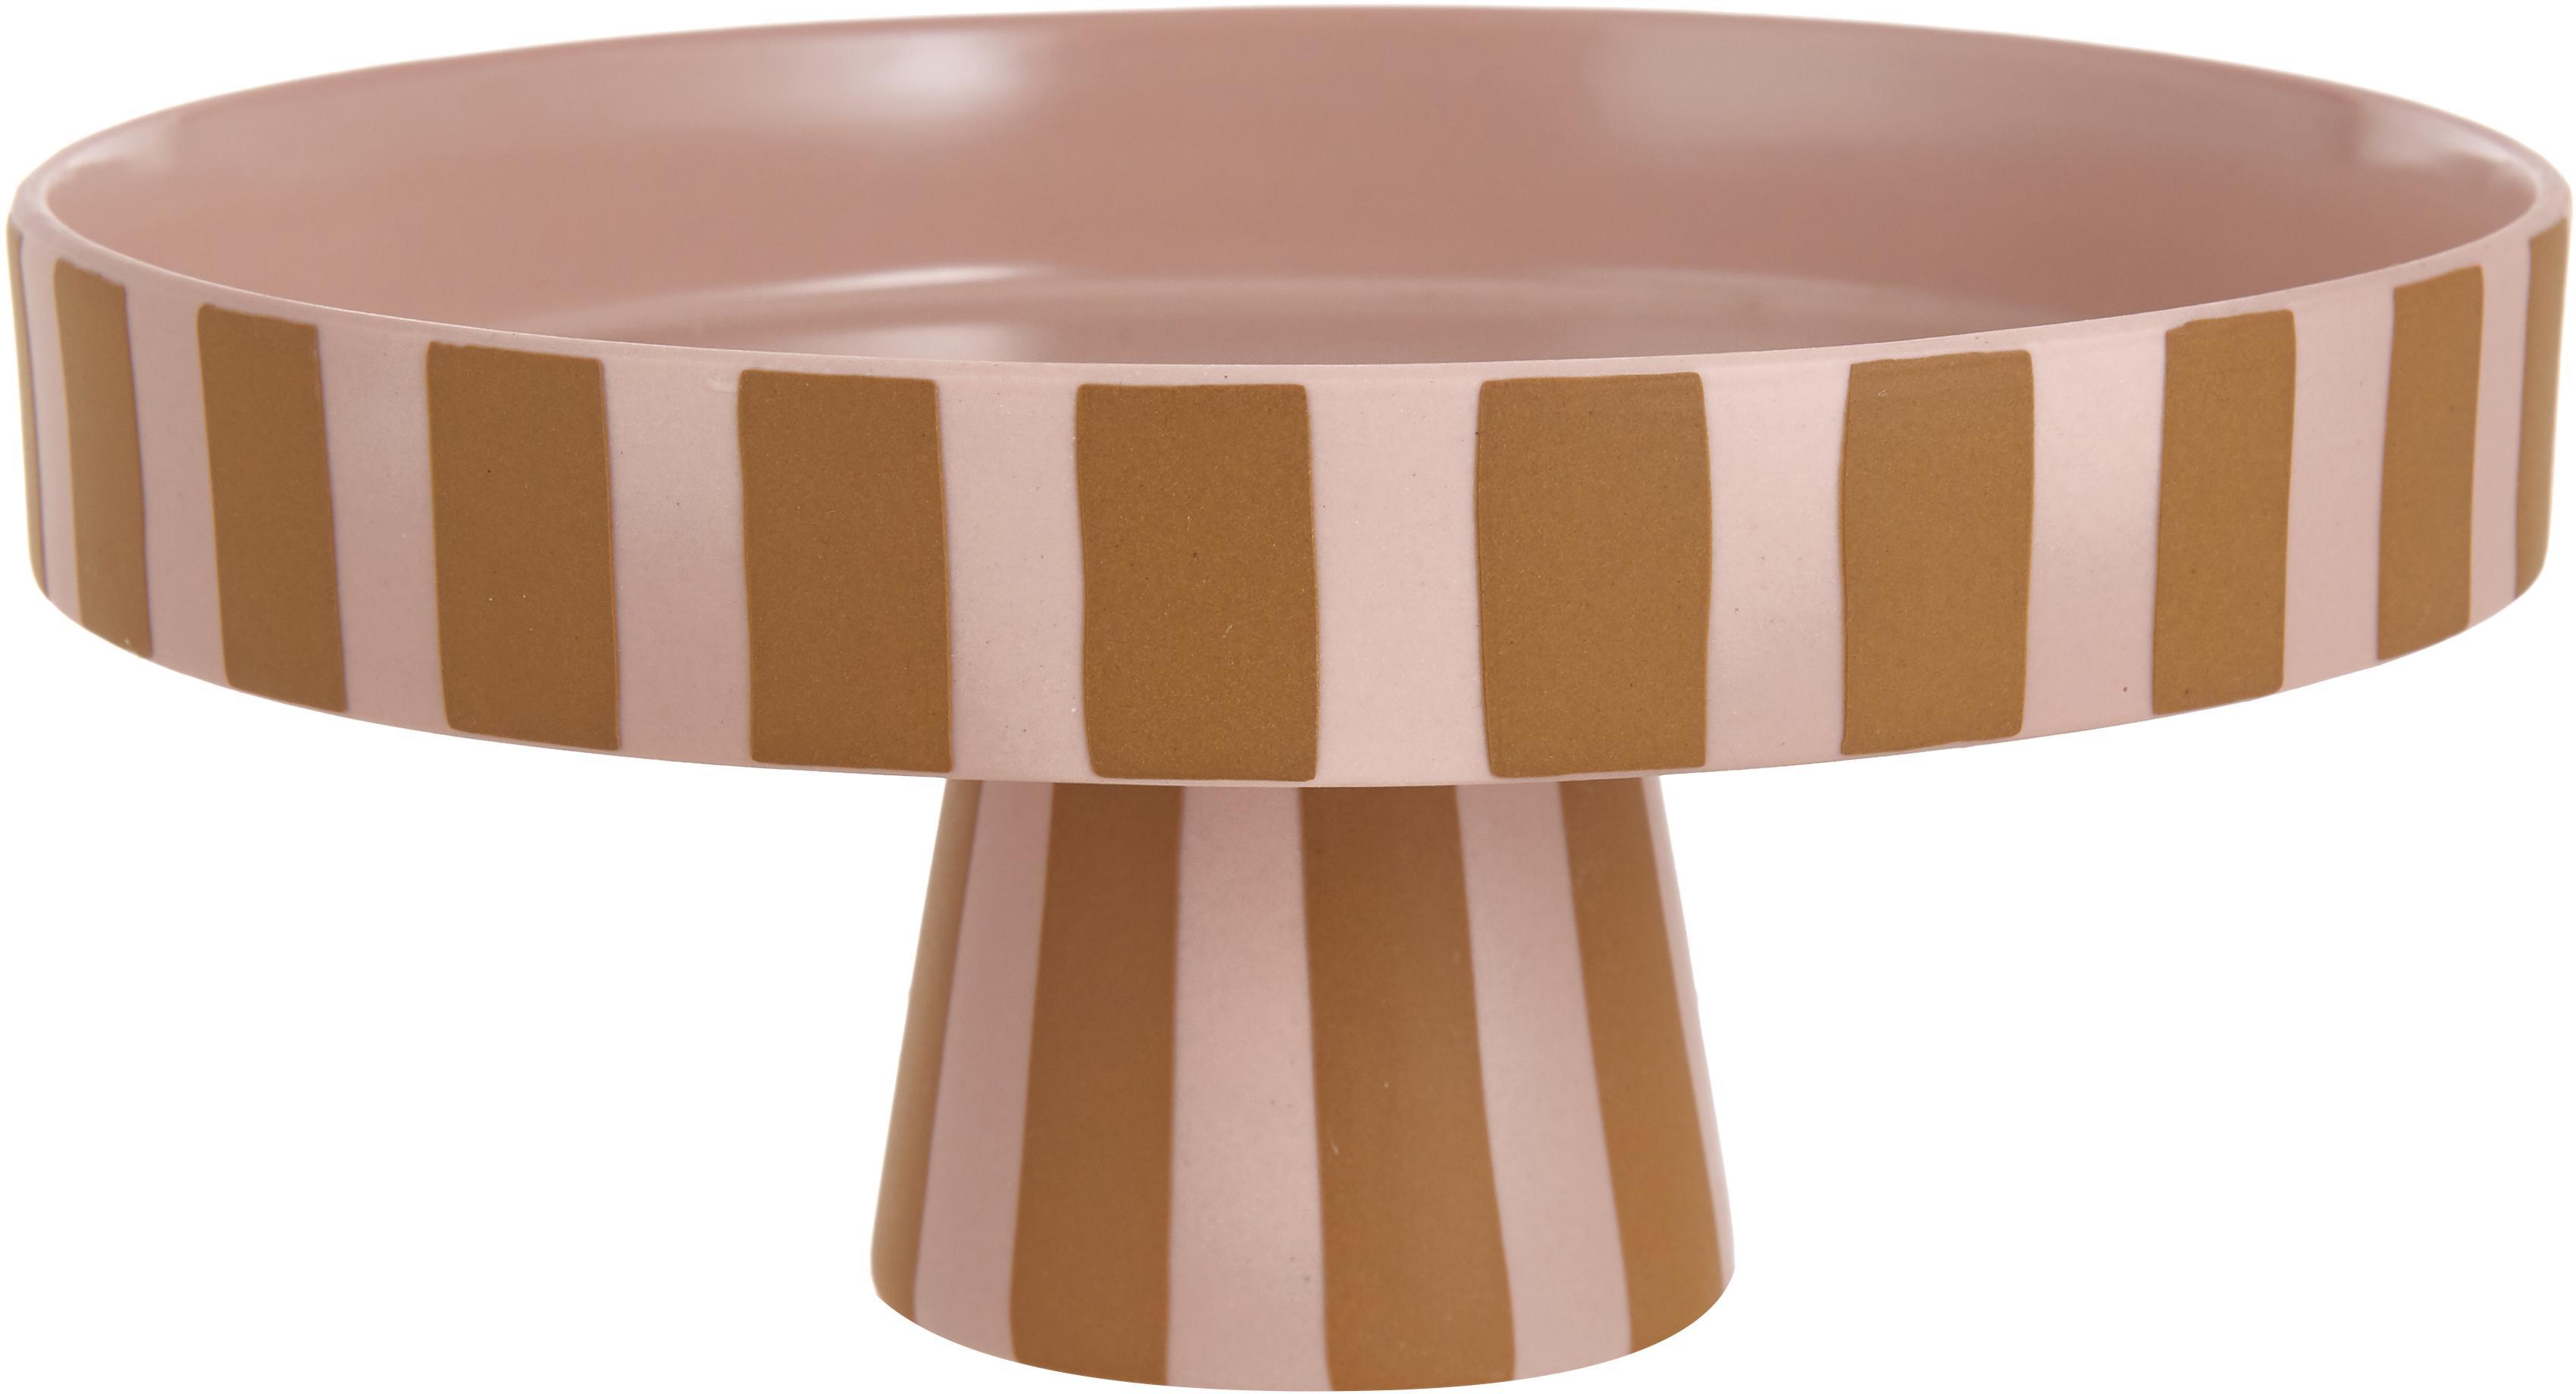 Fuente Toppu, Cerámica, Marrón caramelo, rosa, Ø 20 x Al 9 cm